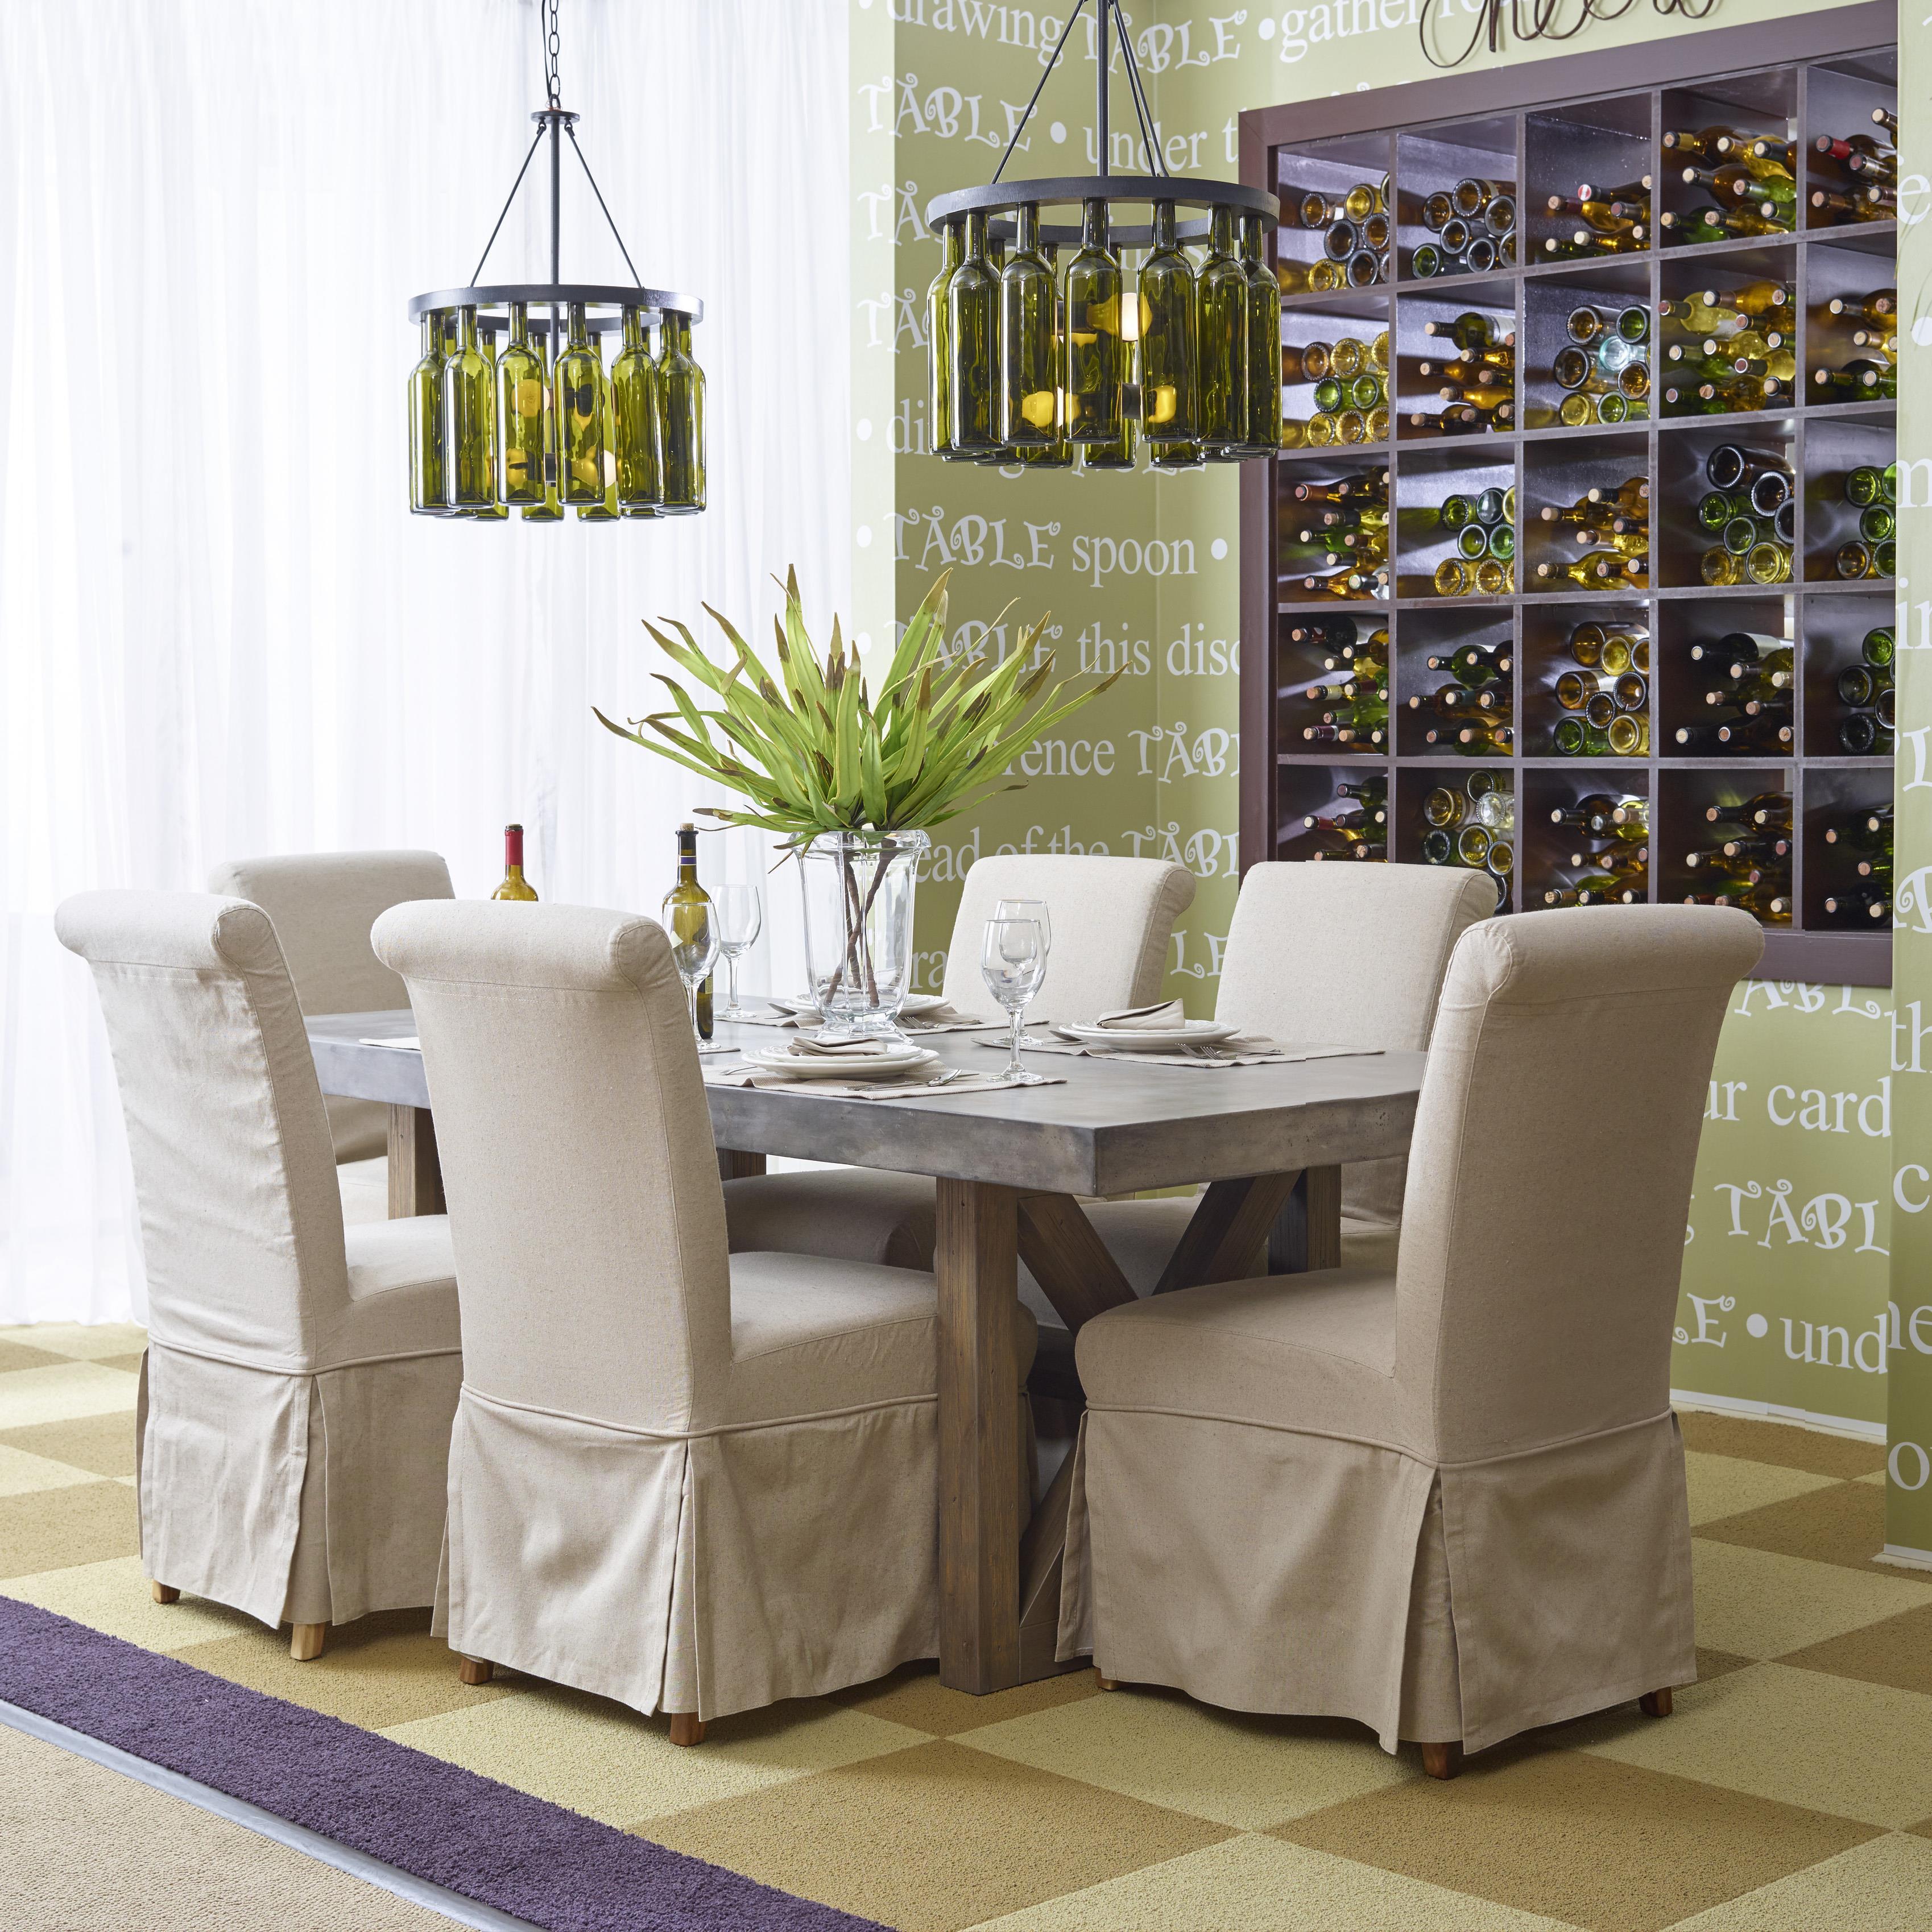 concrete kitchen table Boulder Ridge Concrete Dining Table Rectangle Belfort Furniture Dining Room Table